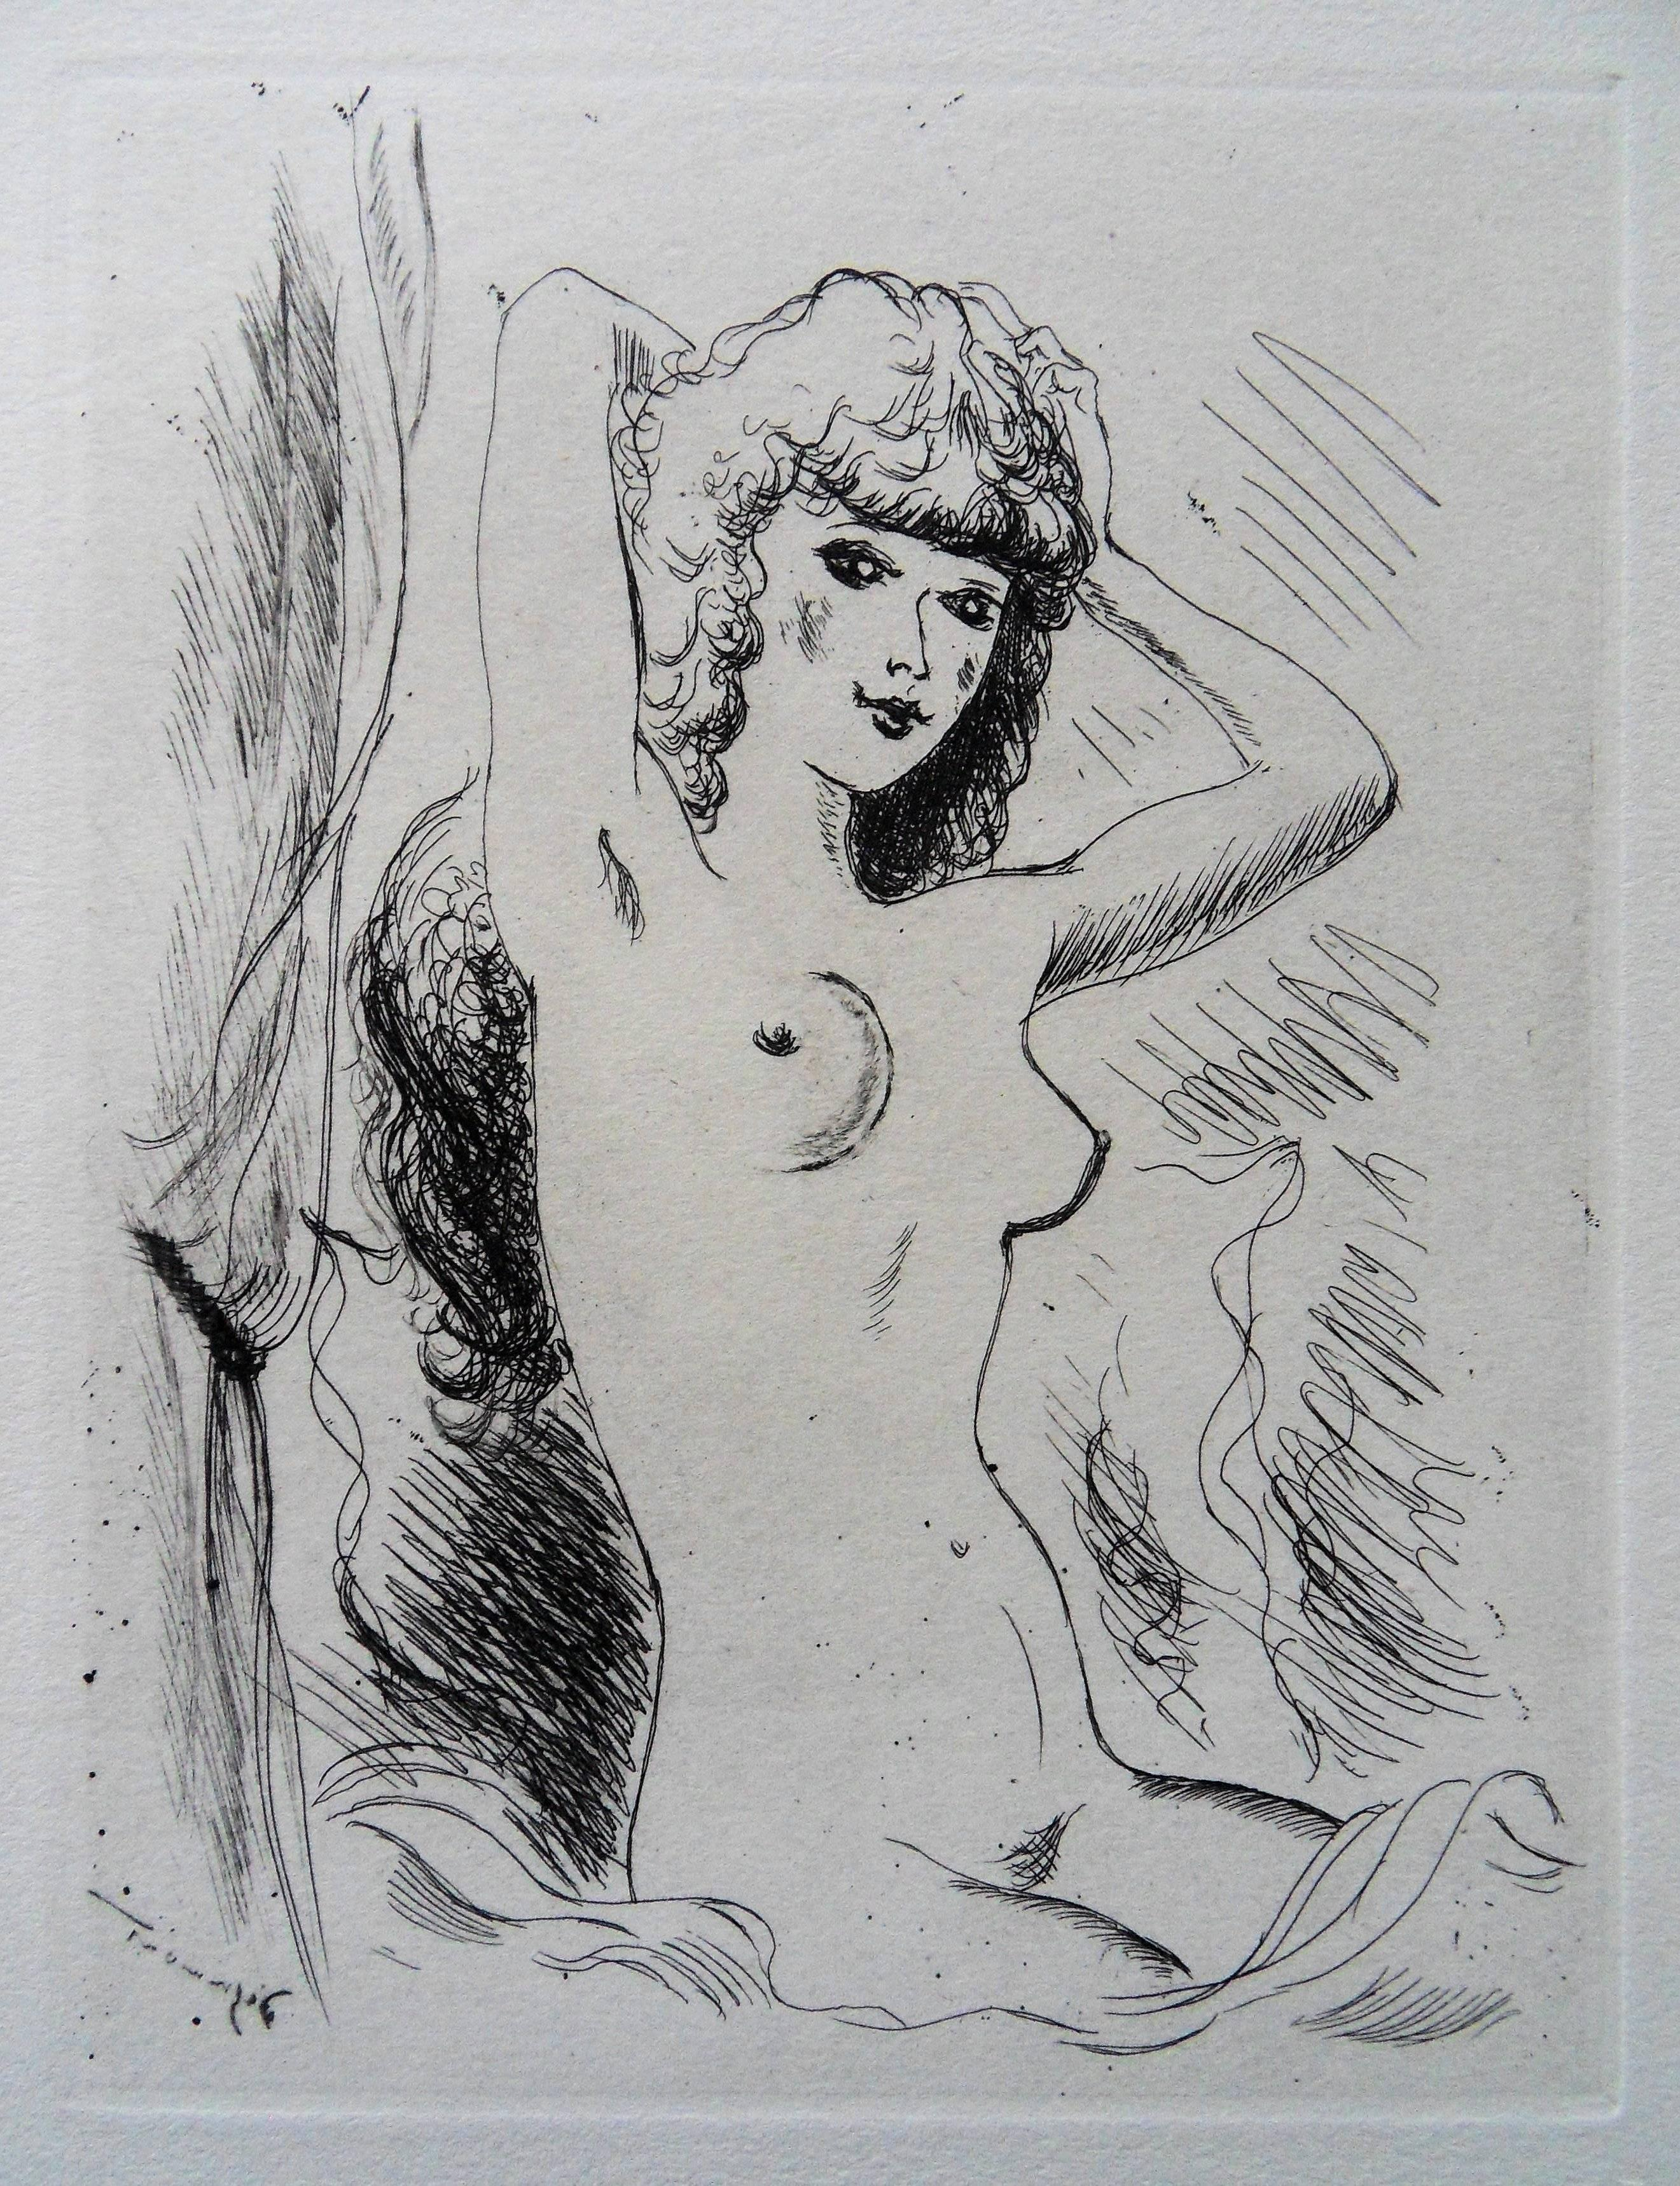 Nude Styling Herself - Original etching, 1943